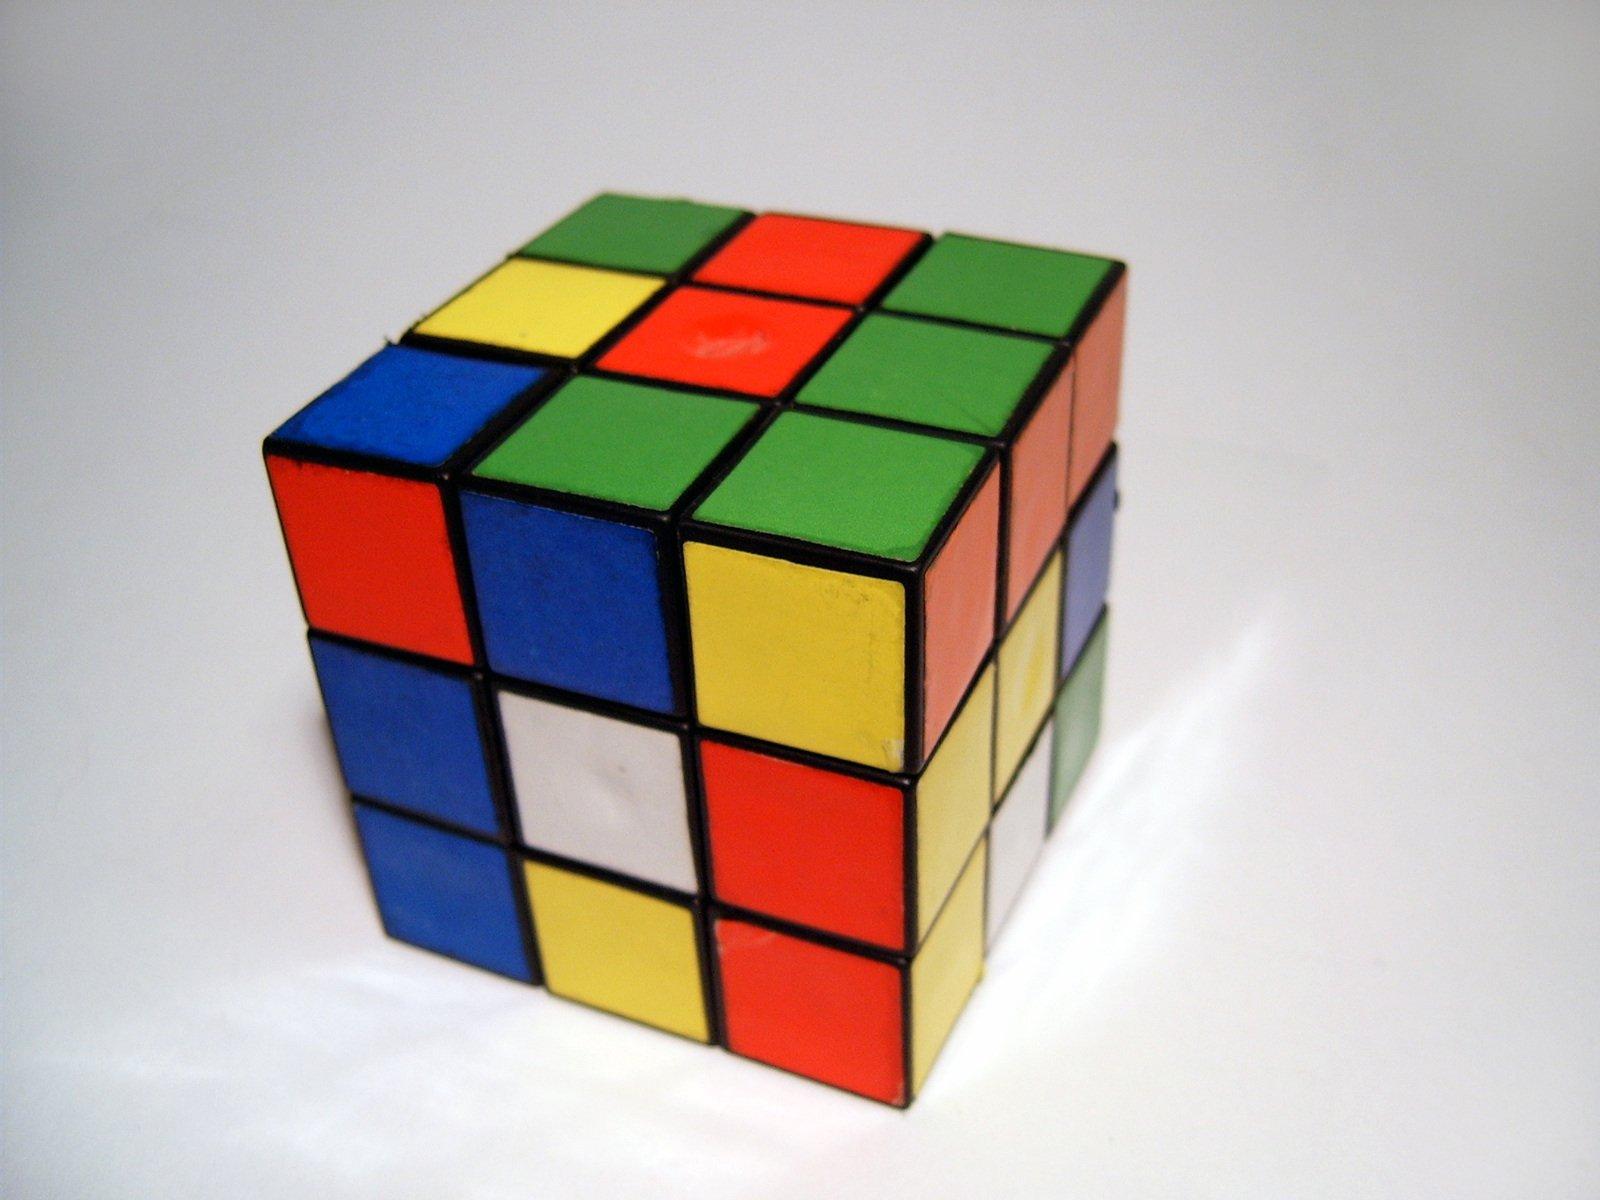 rubik-s-cube-1547479.jpg